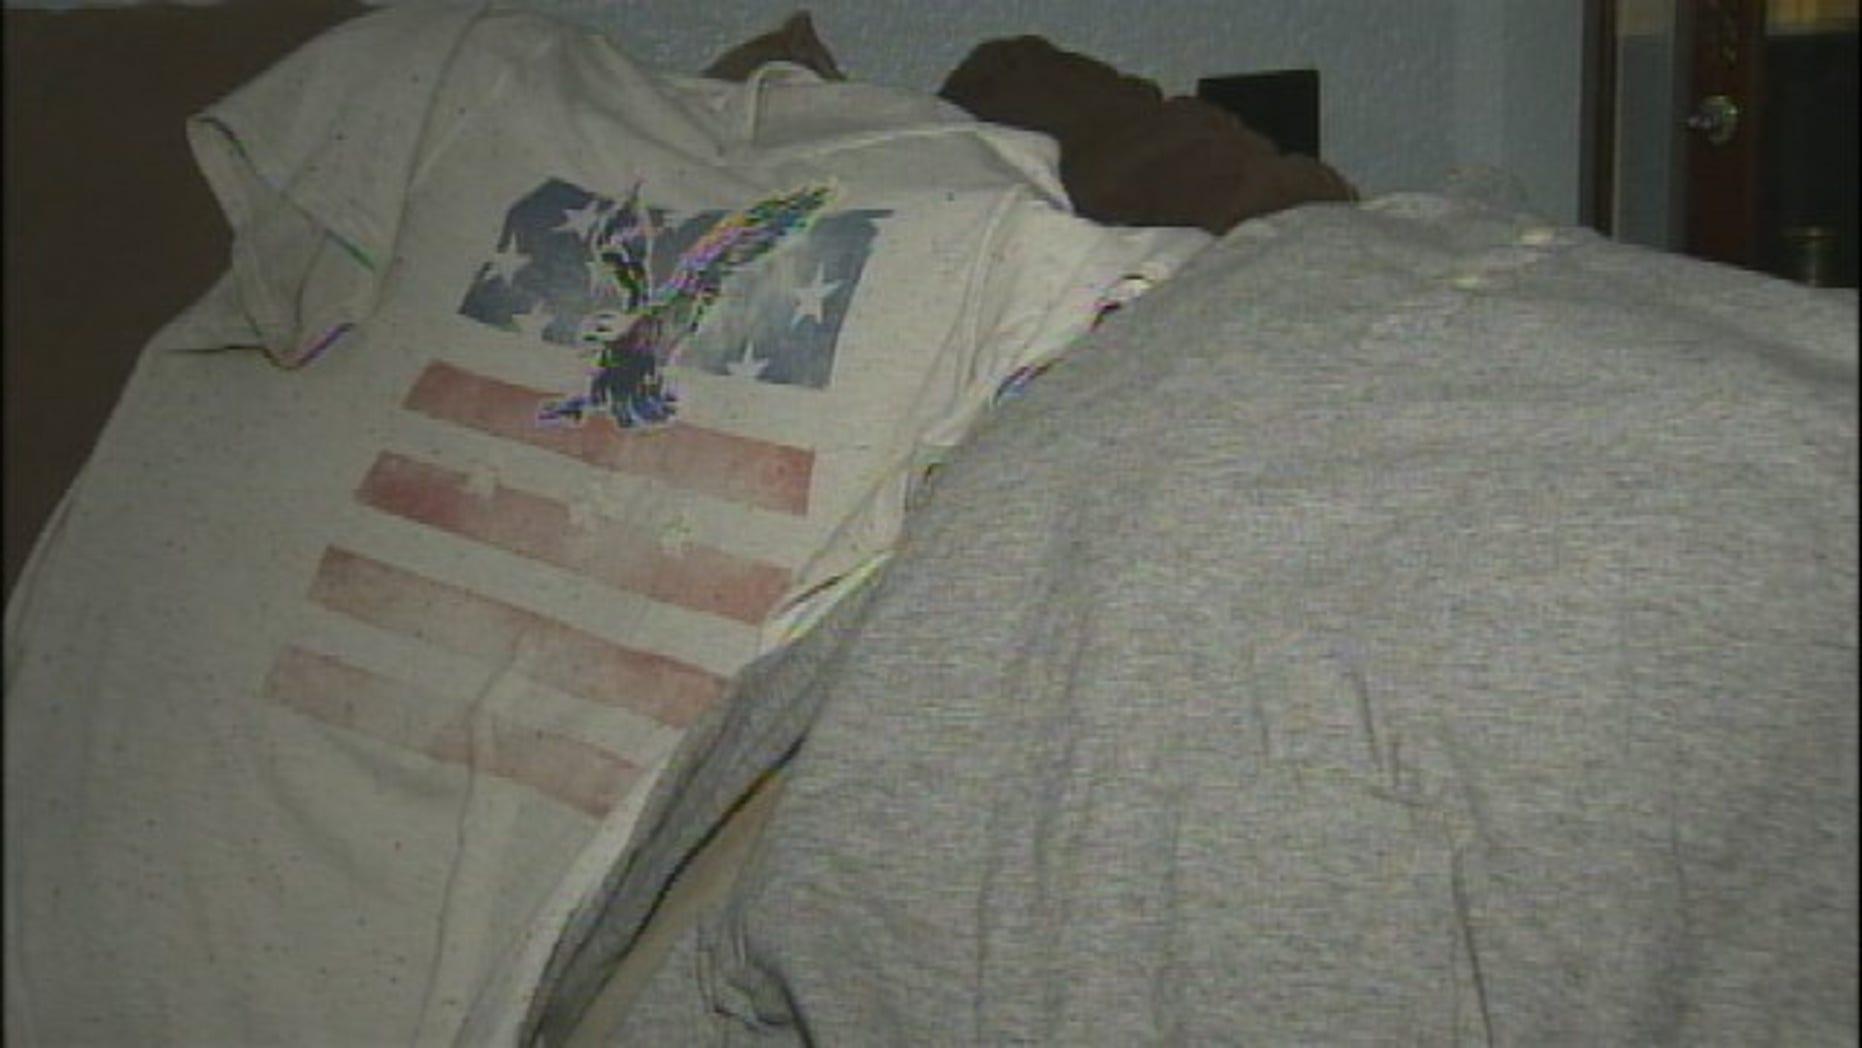 A high school student's American flag T-shirt got him an in-school suspension. (Credit: FOX 4 NEWS/Dallas)